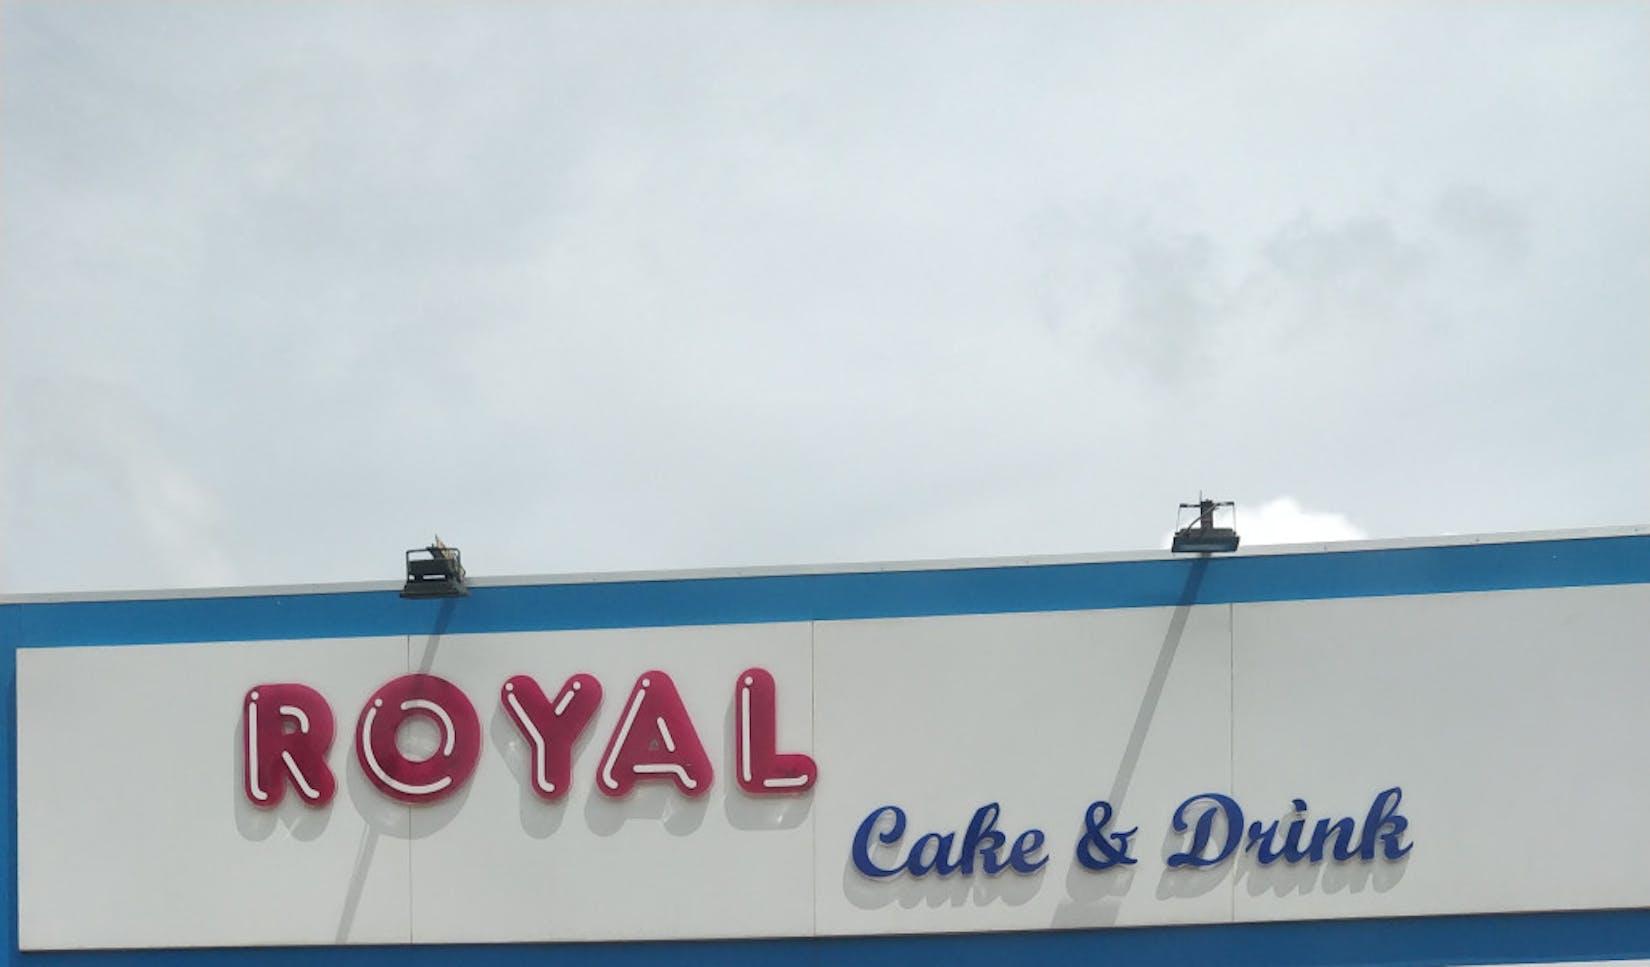 Royal Cake & Drink | yathar